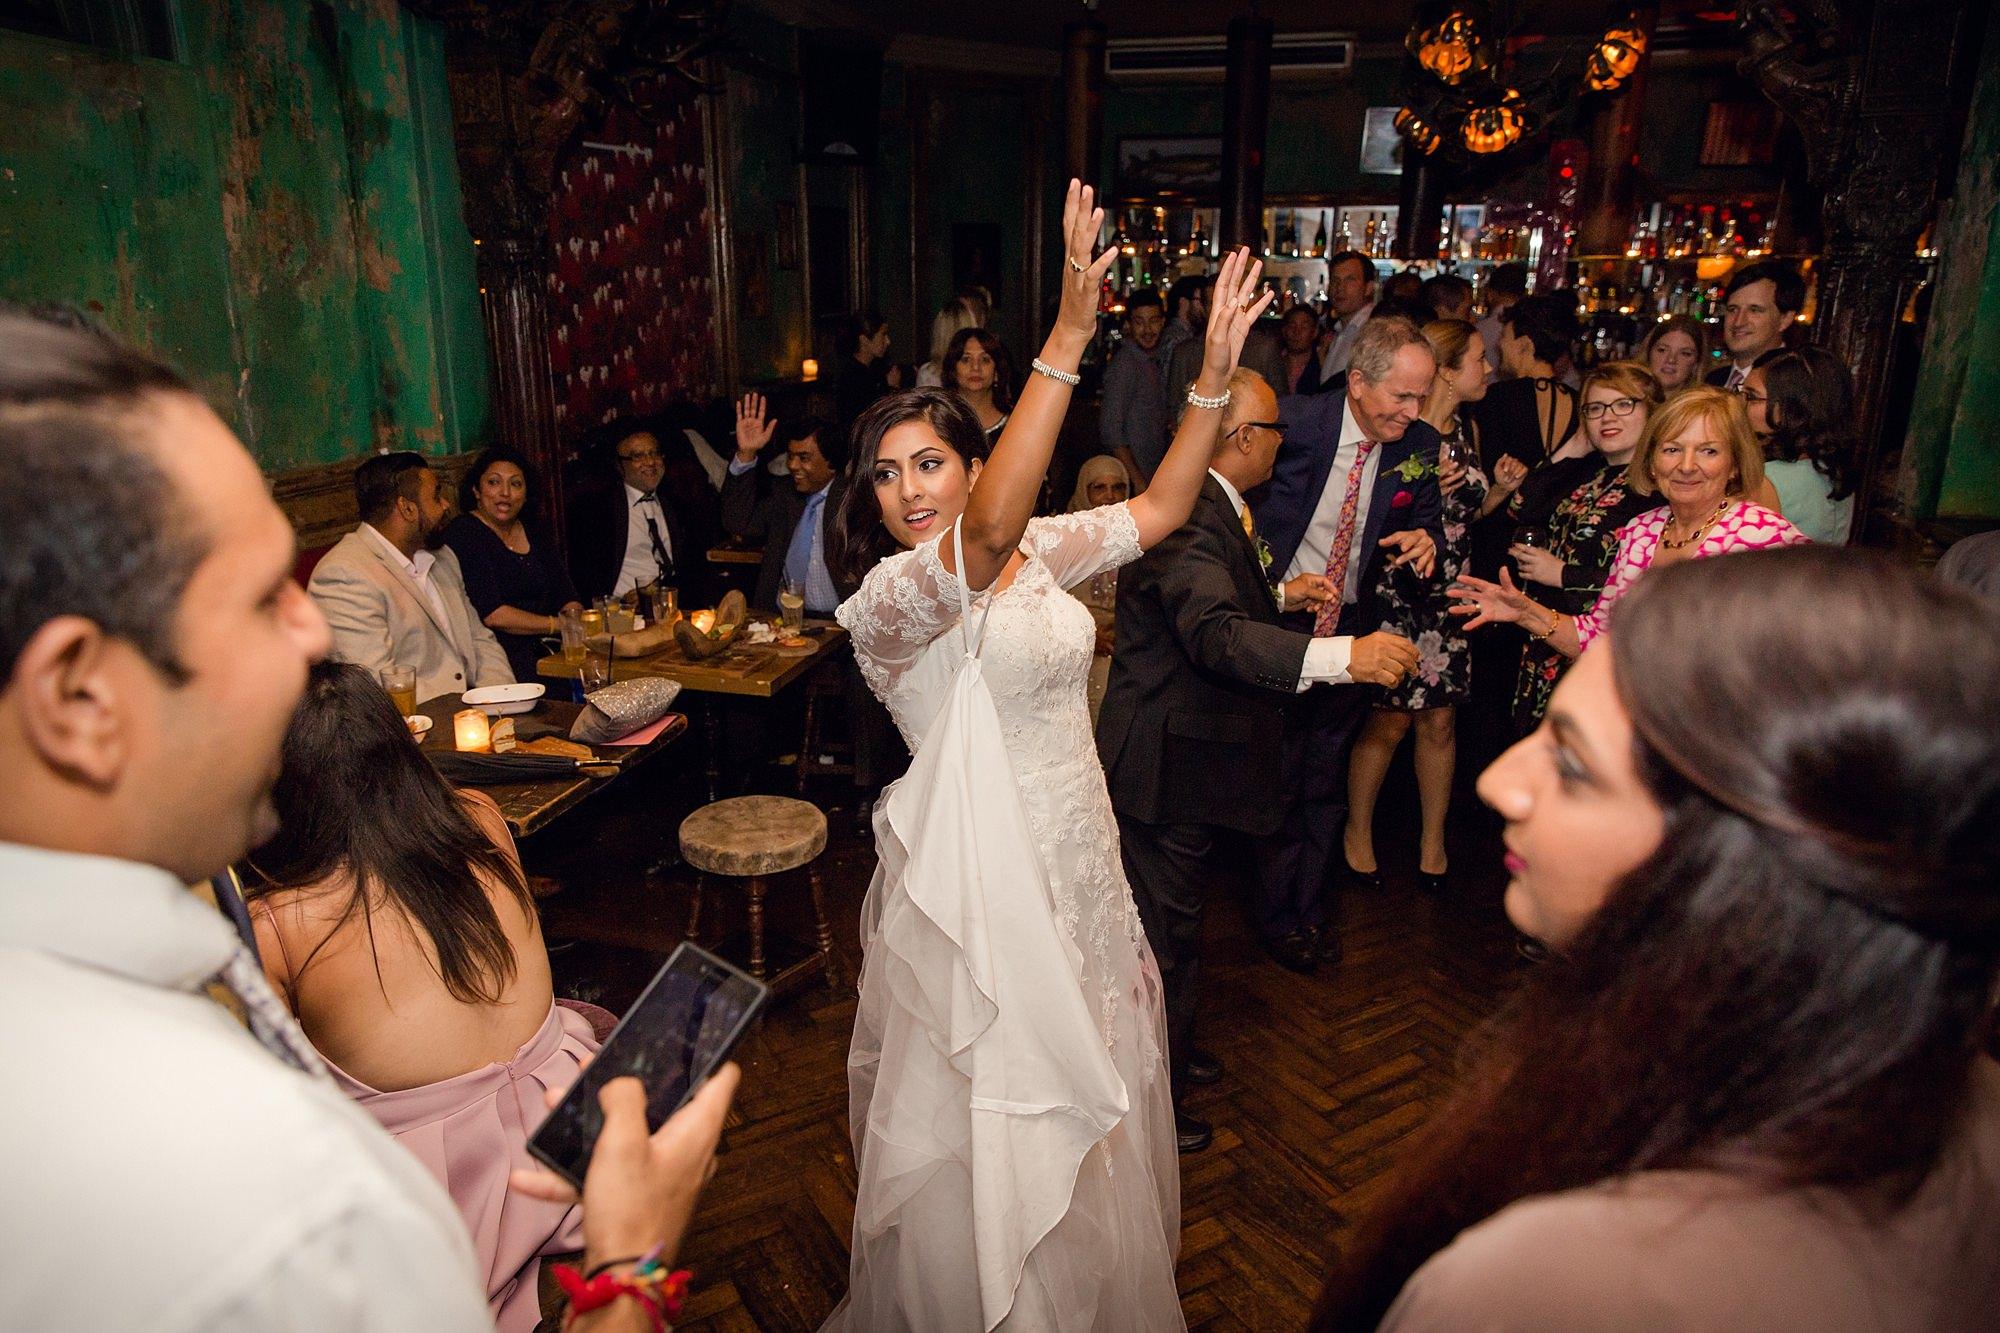 Paradise by way of Kensal Green wedding dancing bride